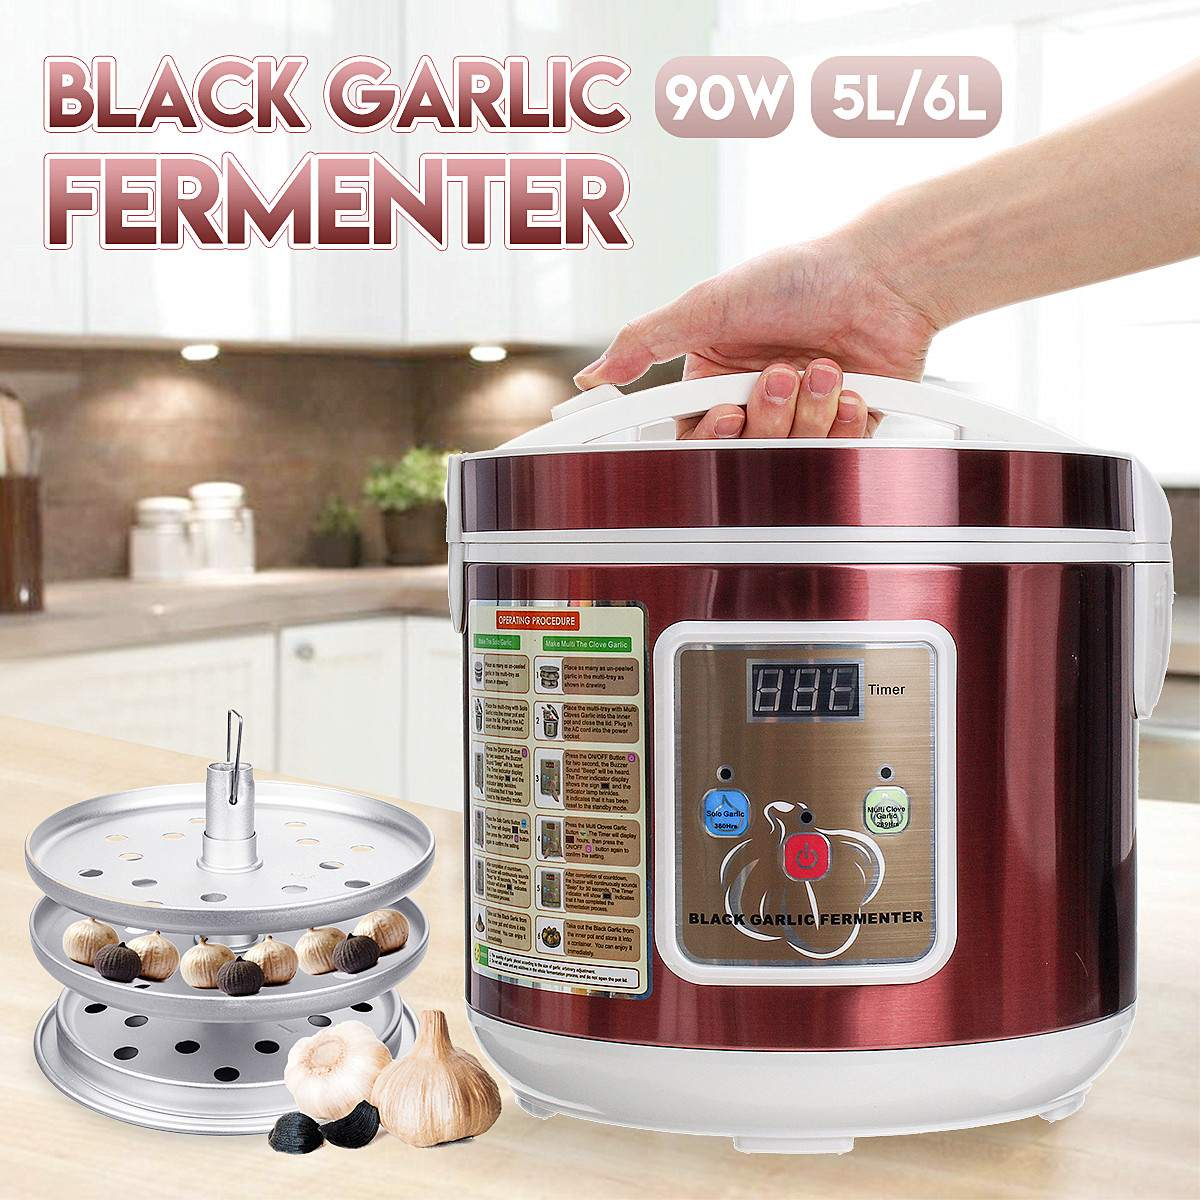 5L 6L 90W Automatic Black Garlic Fermenter Maker 110V/220V Home diy Fermentation Machine Kitchen Cooking Tools Dropshipping5L 6L 90W Automatic Black Garlic Fermenter Maker 110V/220V Home diy Fermentation Machine Kitchen Cooking Tools Dropshipping